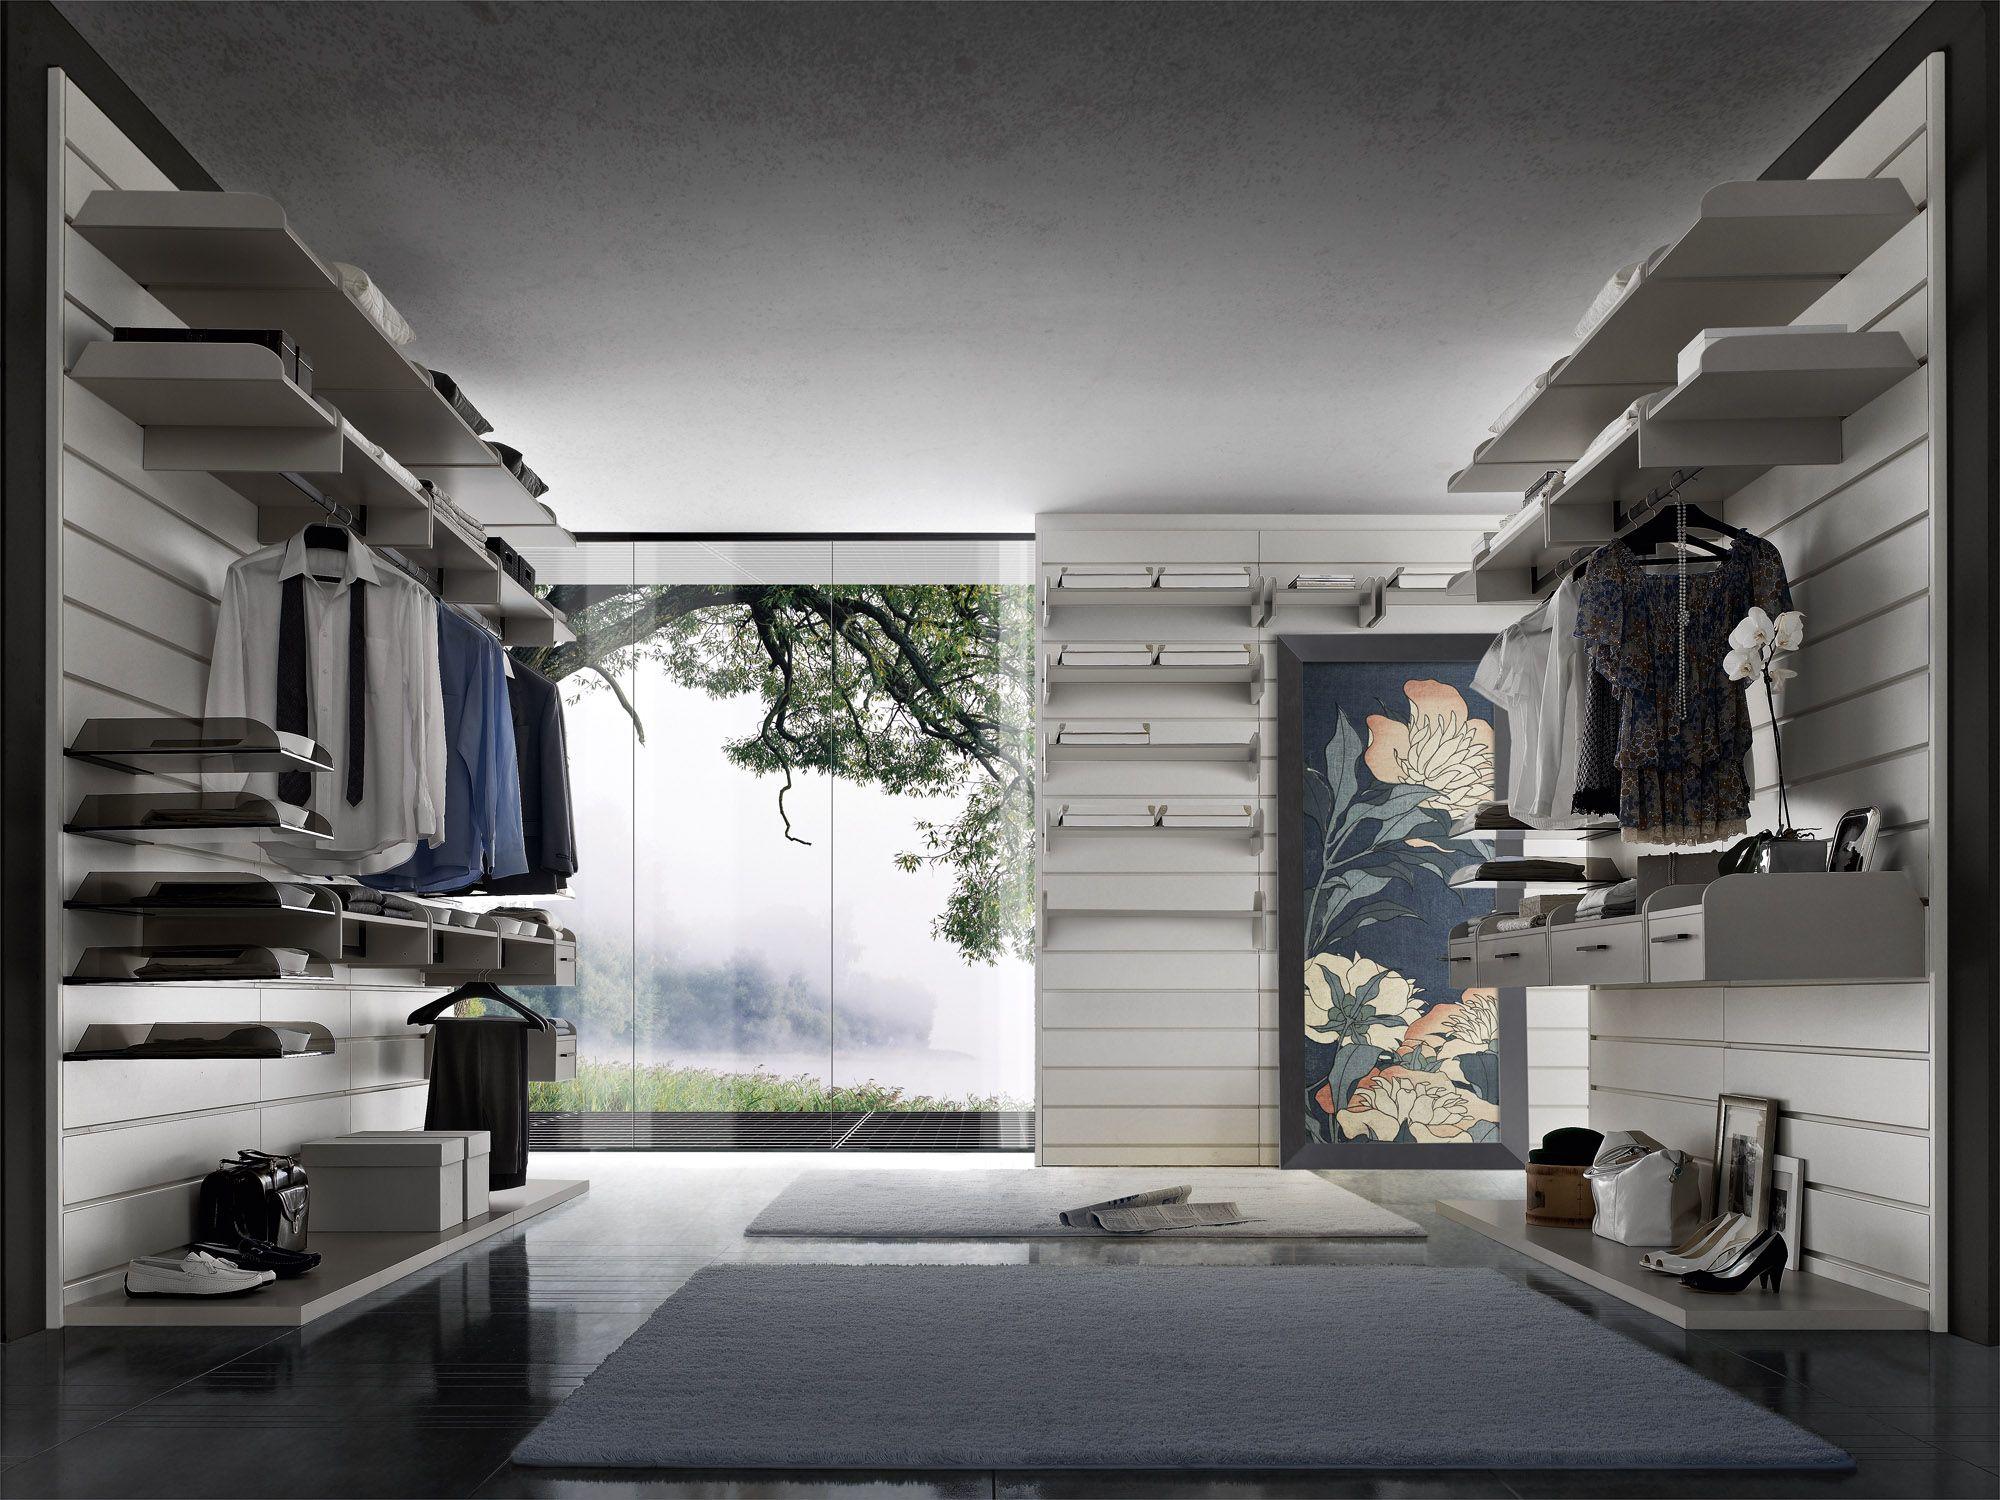 Cabina Armadio Walk In Closets : Cabina armadio millemodi zanette it it products